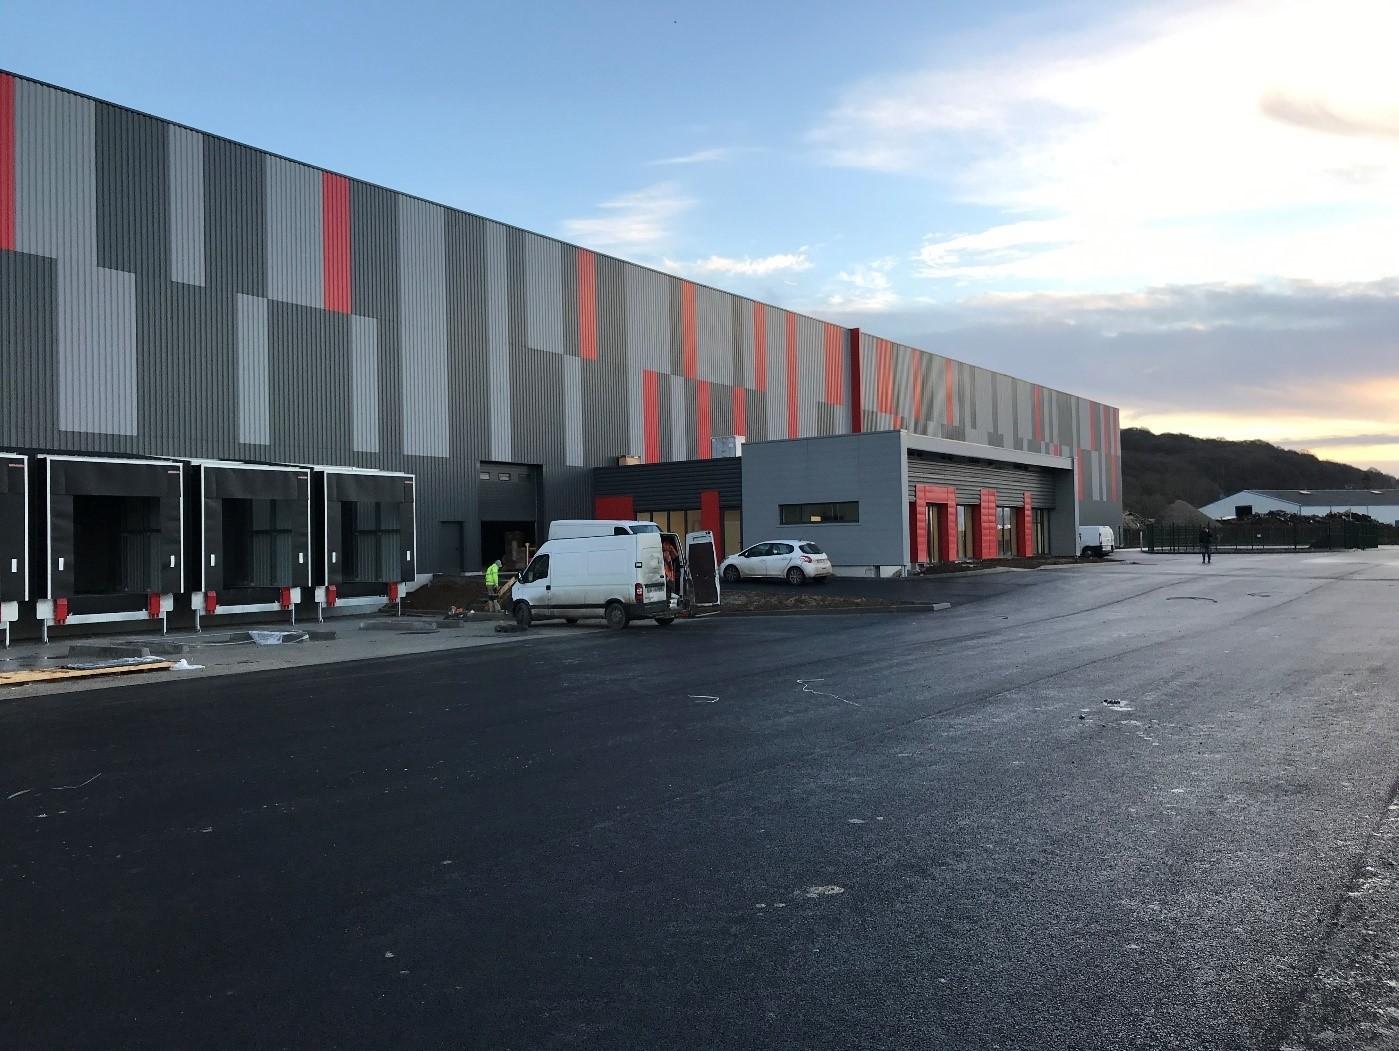 Entrepôt de stockage Gca1